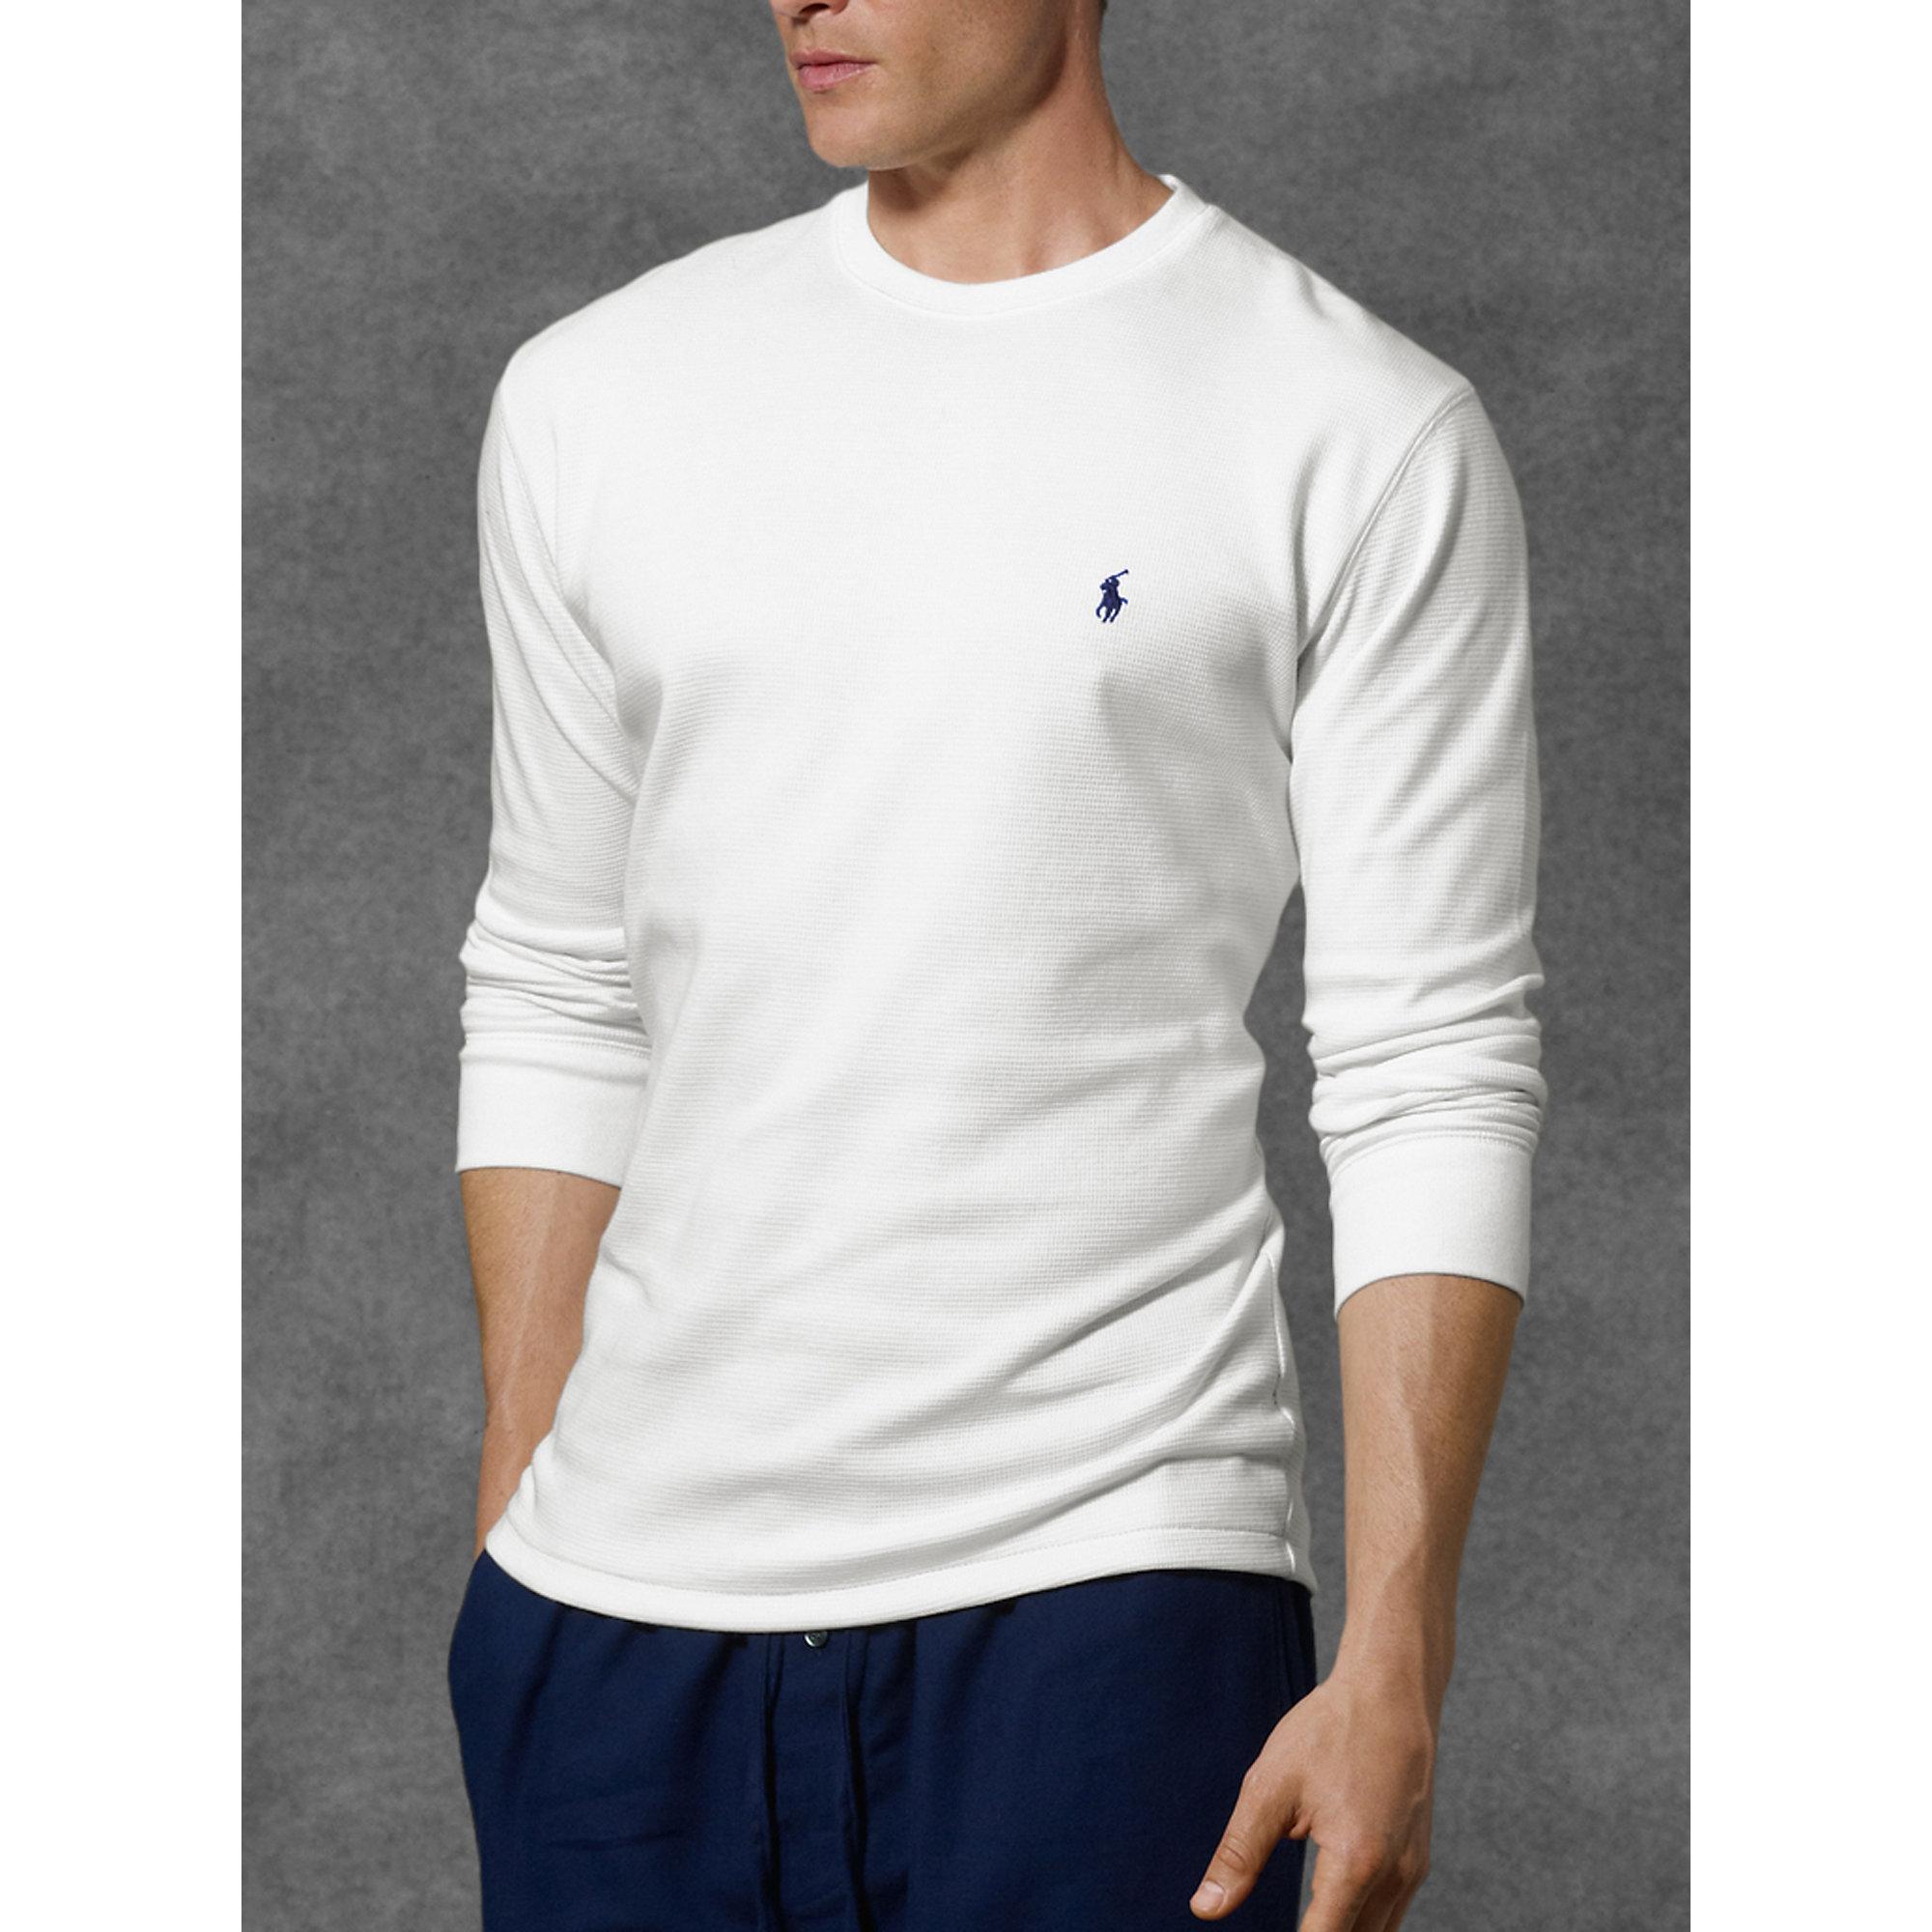 dbe3cf62 ... Beige Waffle Knit Sweatshirt: Polo Ralph Lauren Waffle-knit Crewneck  Thermal In White